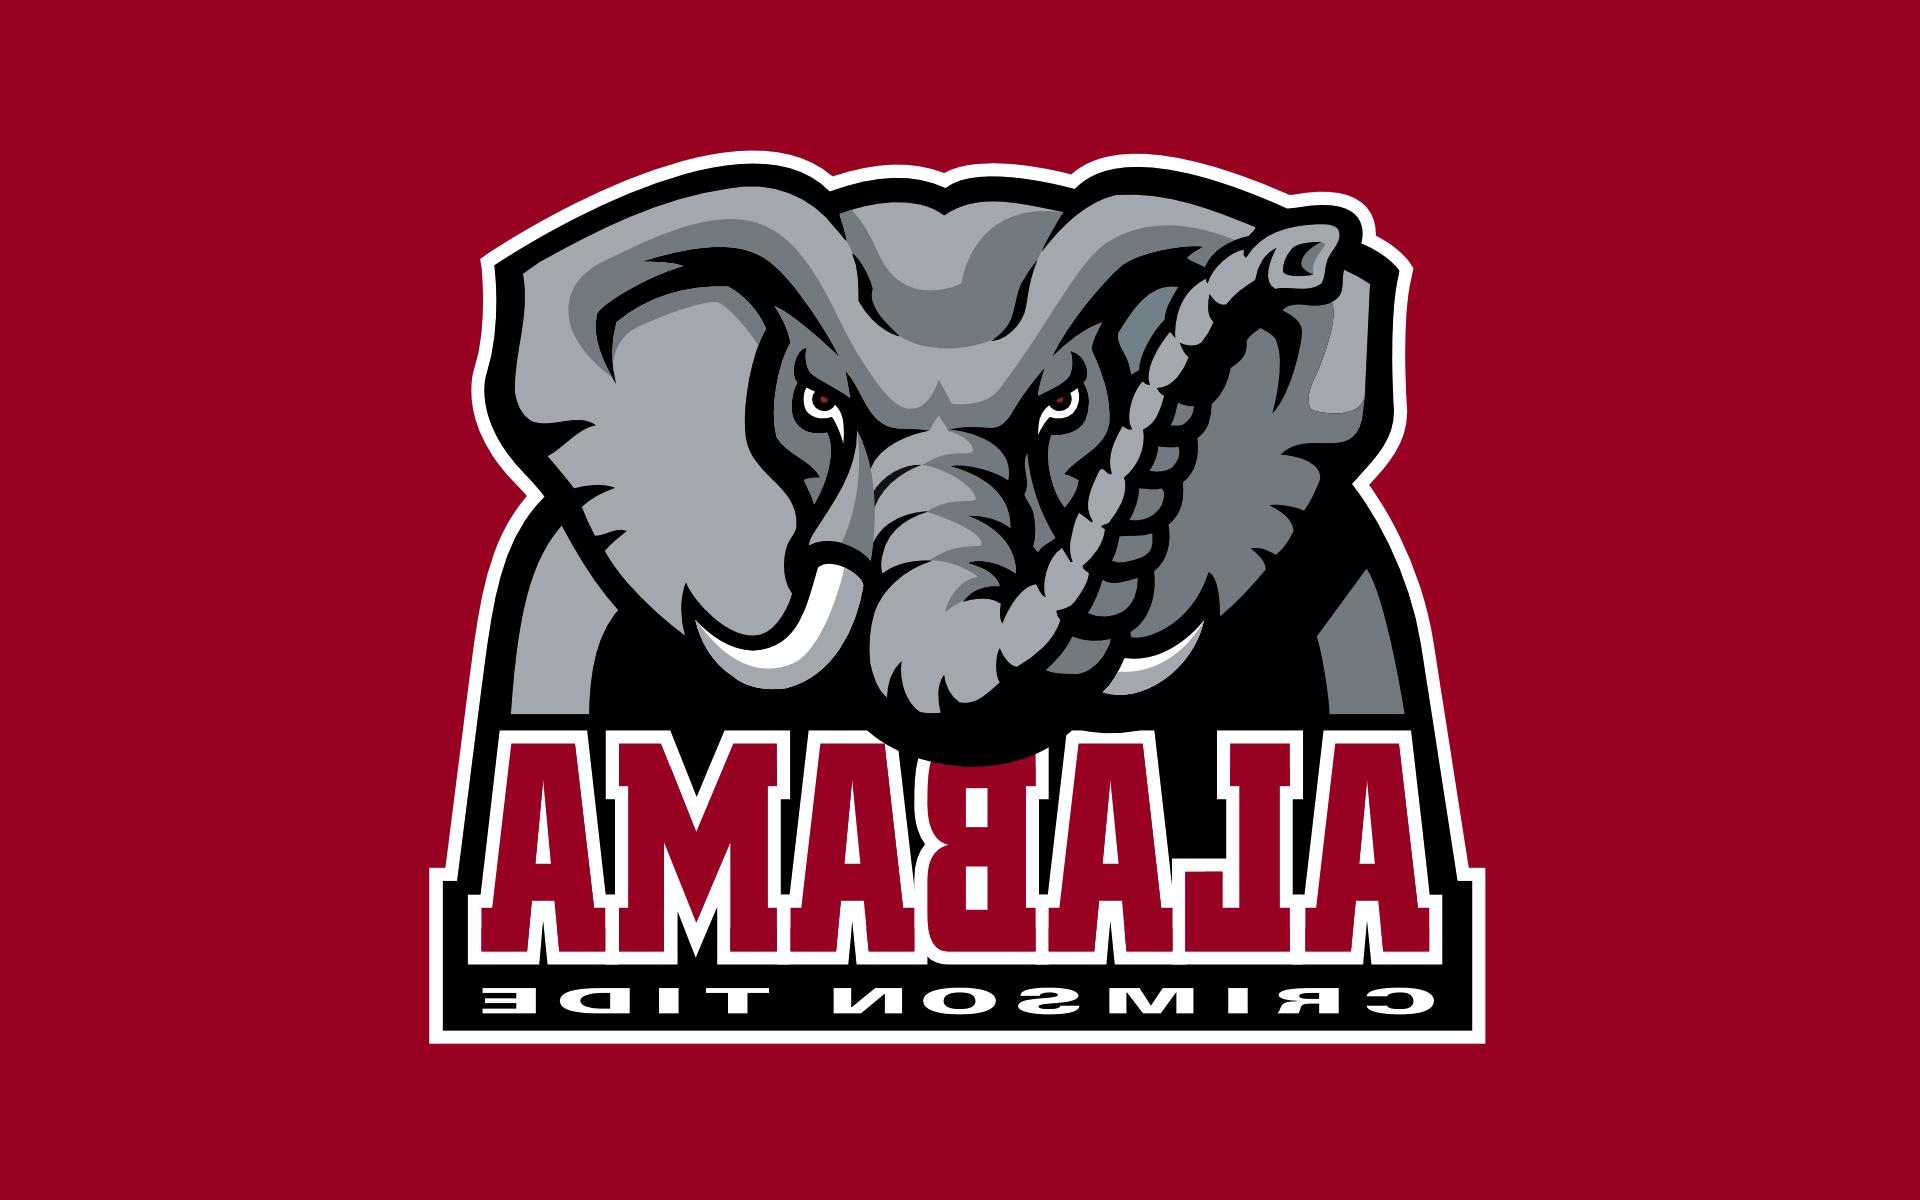 Alabama Logo Wallpaper Wallpapersafari